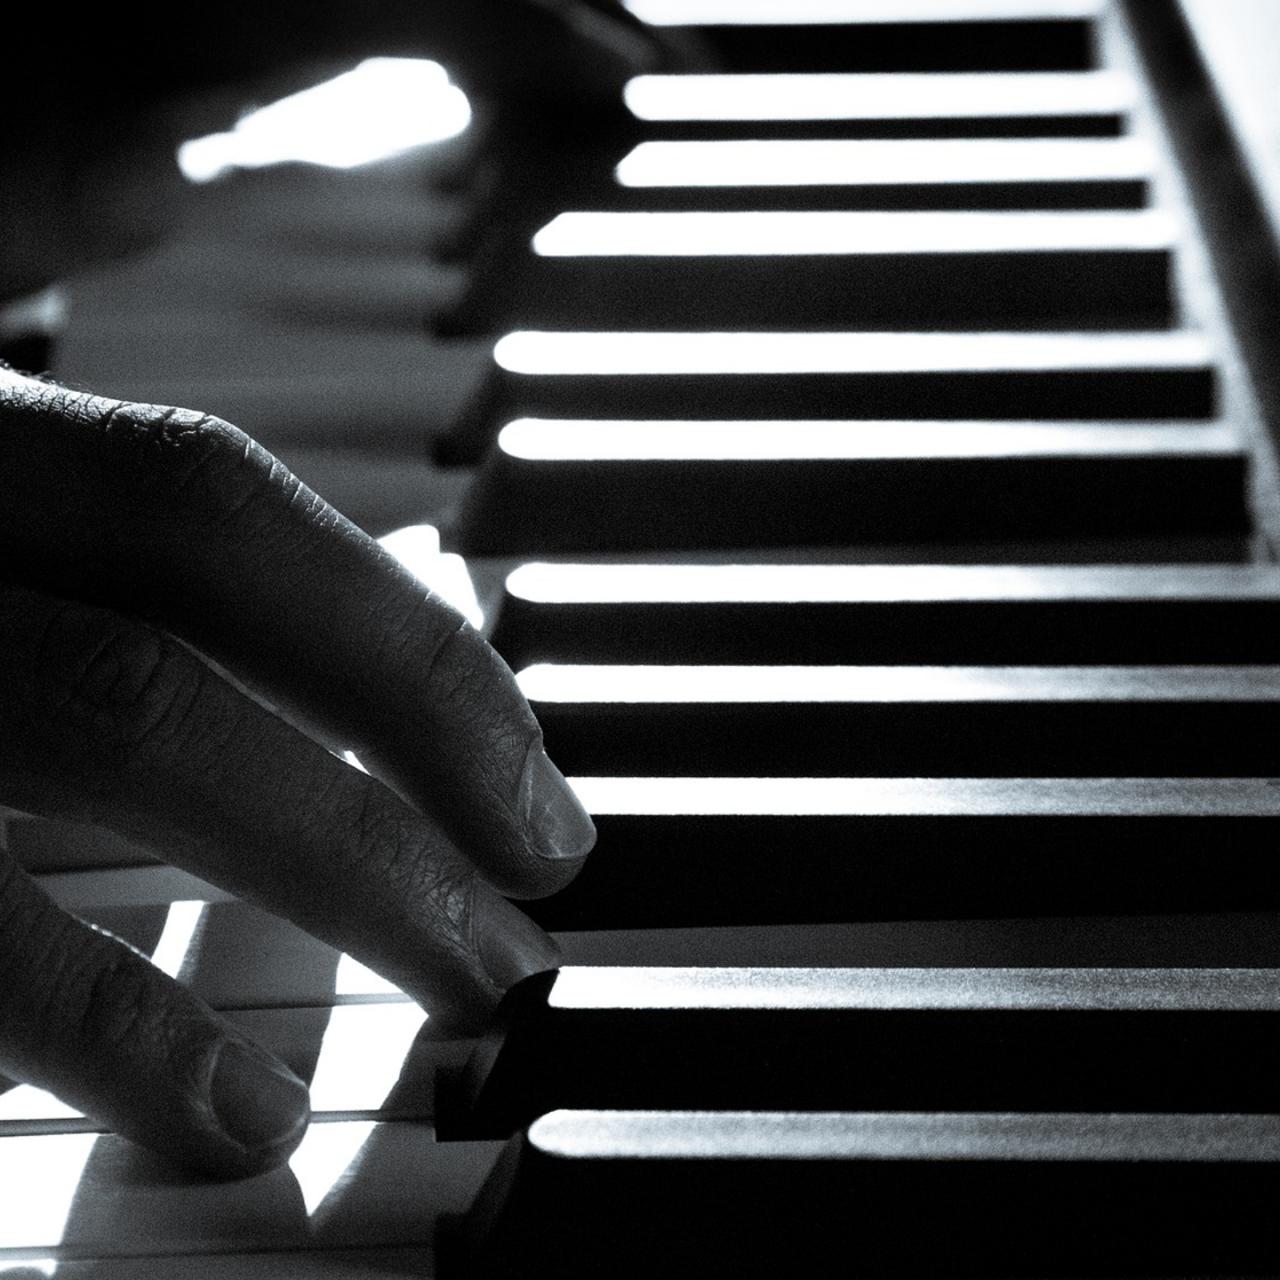 http://dublinschoolofmusic.ie/wp-content/uploads/2019/11/Piano1-1280x1280.png